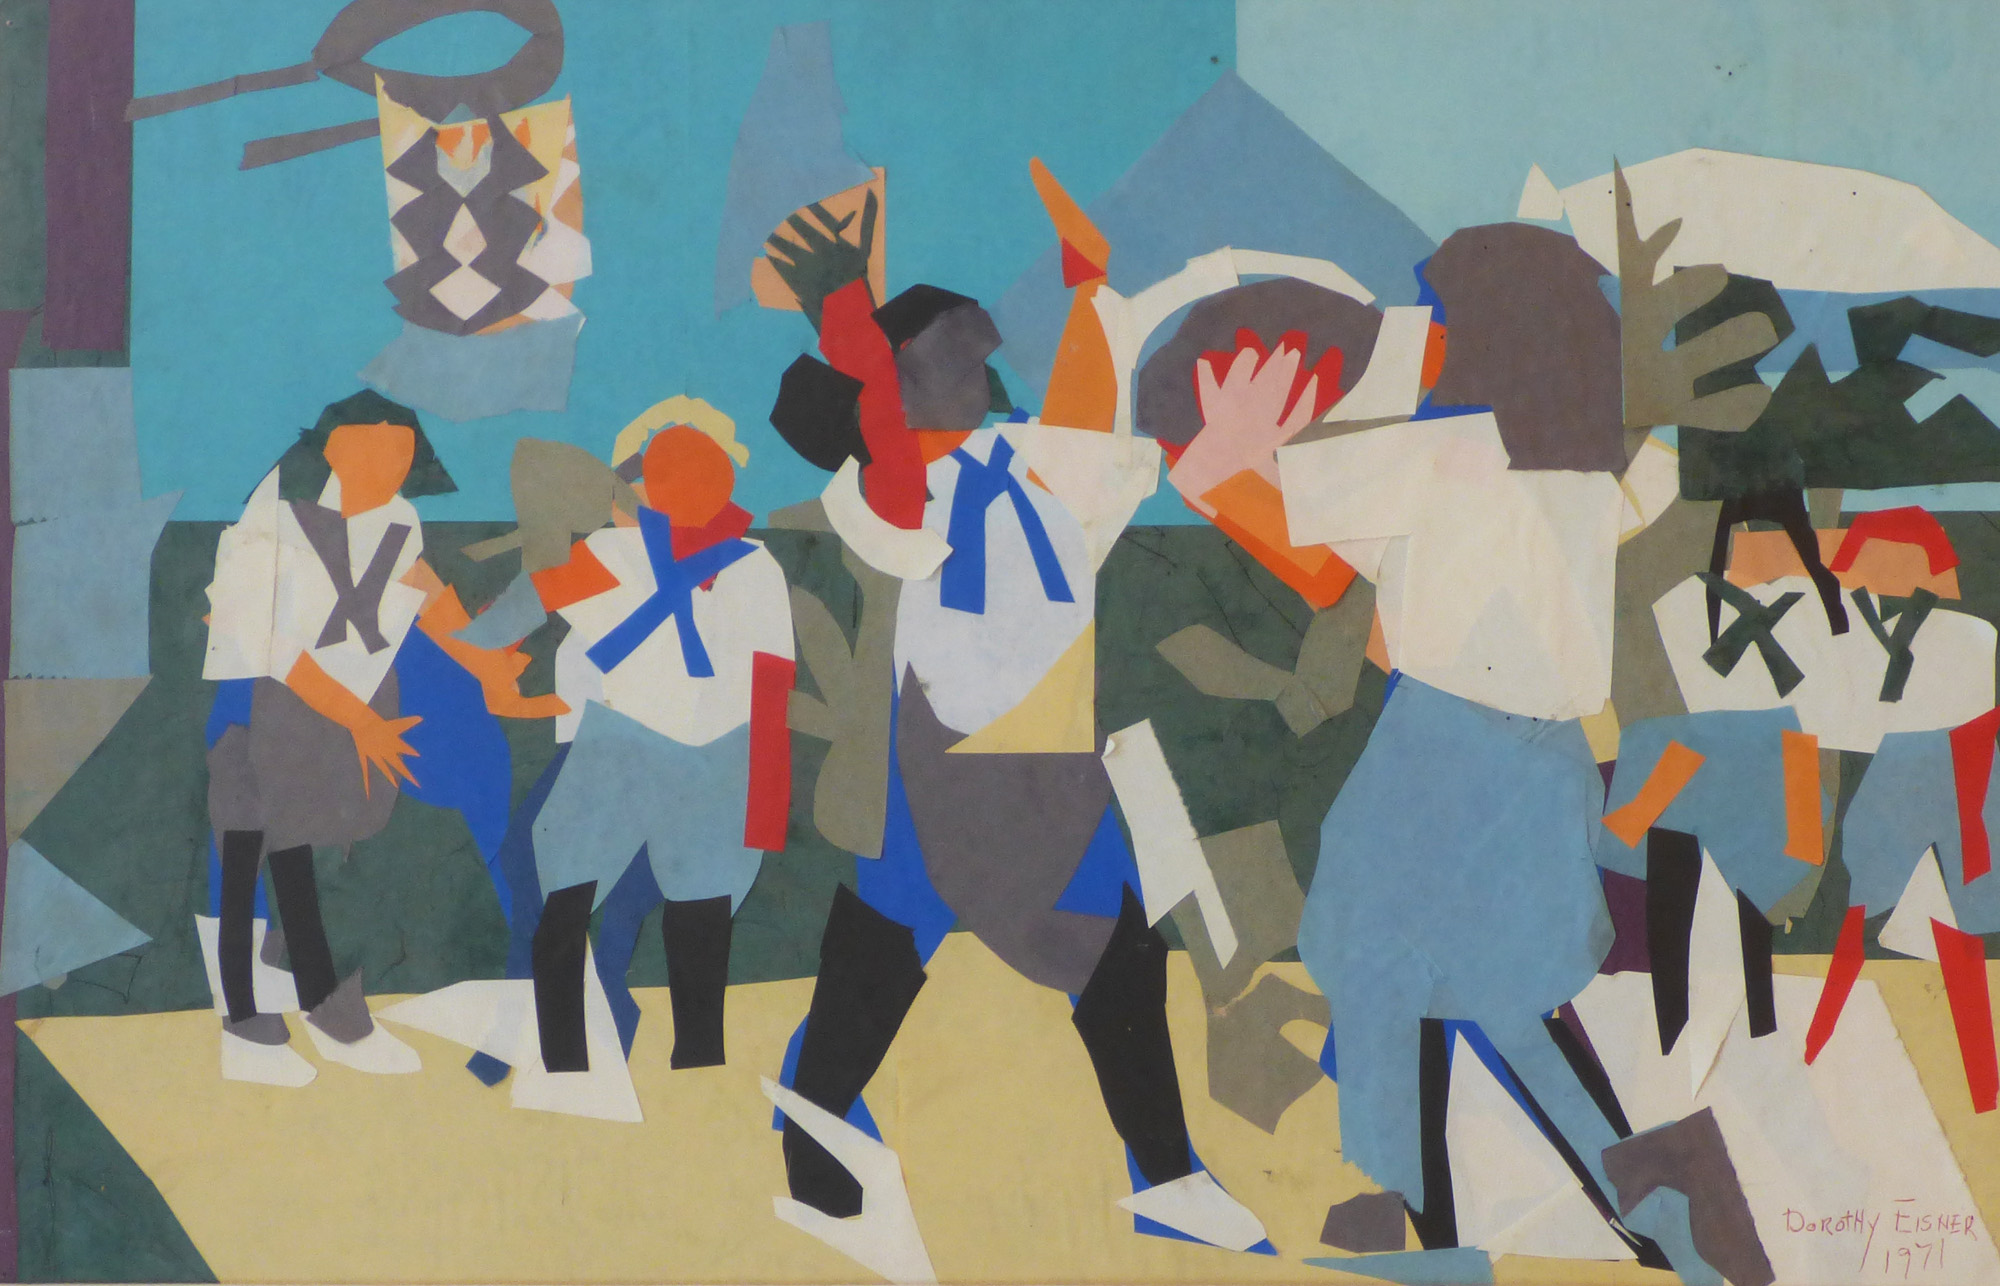 Dorothy Eisner, Camp Basketball collage, 14x22